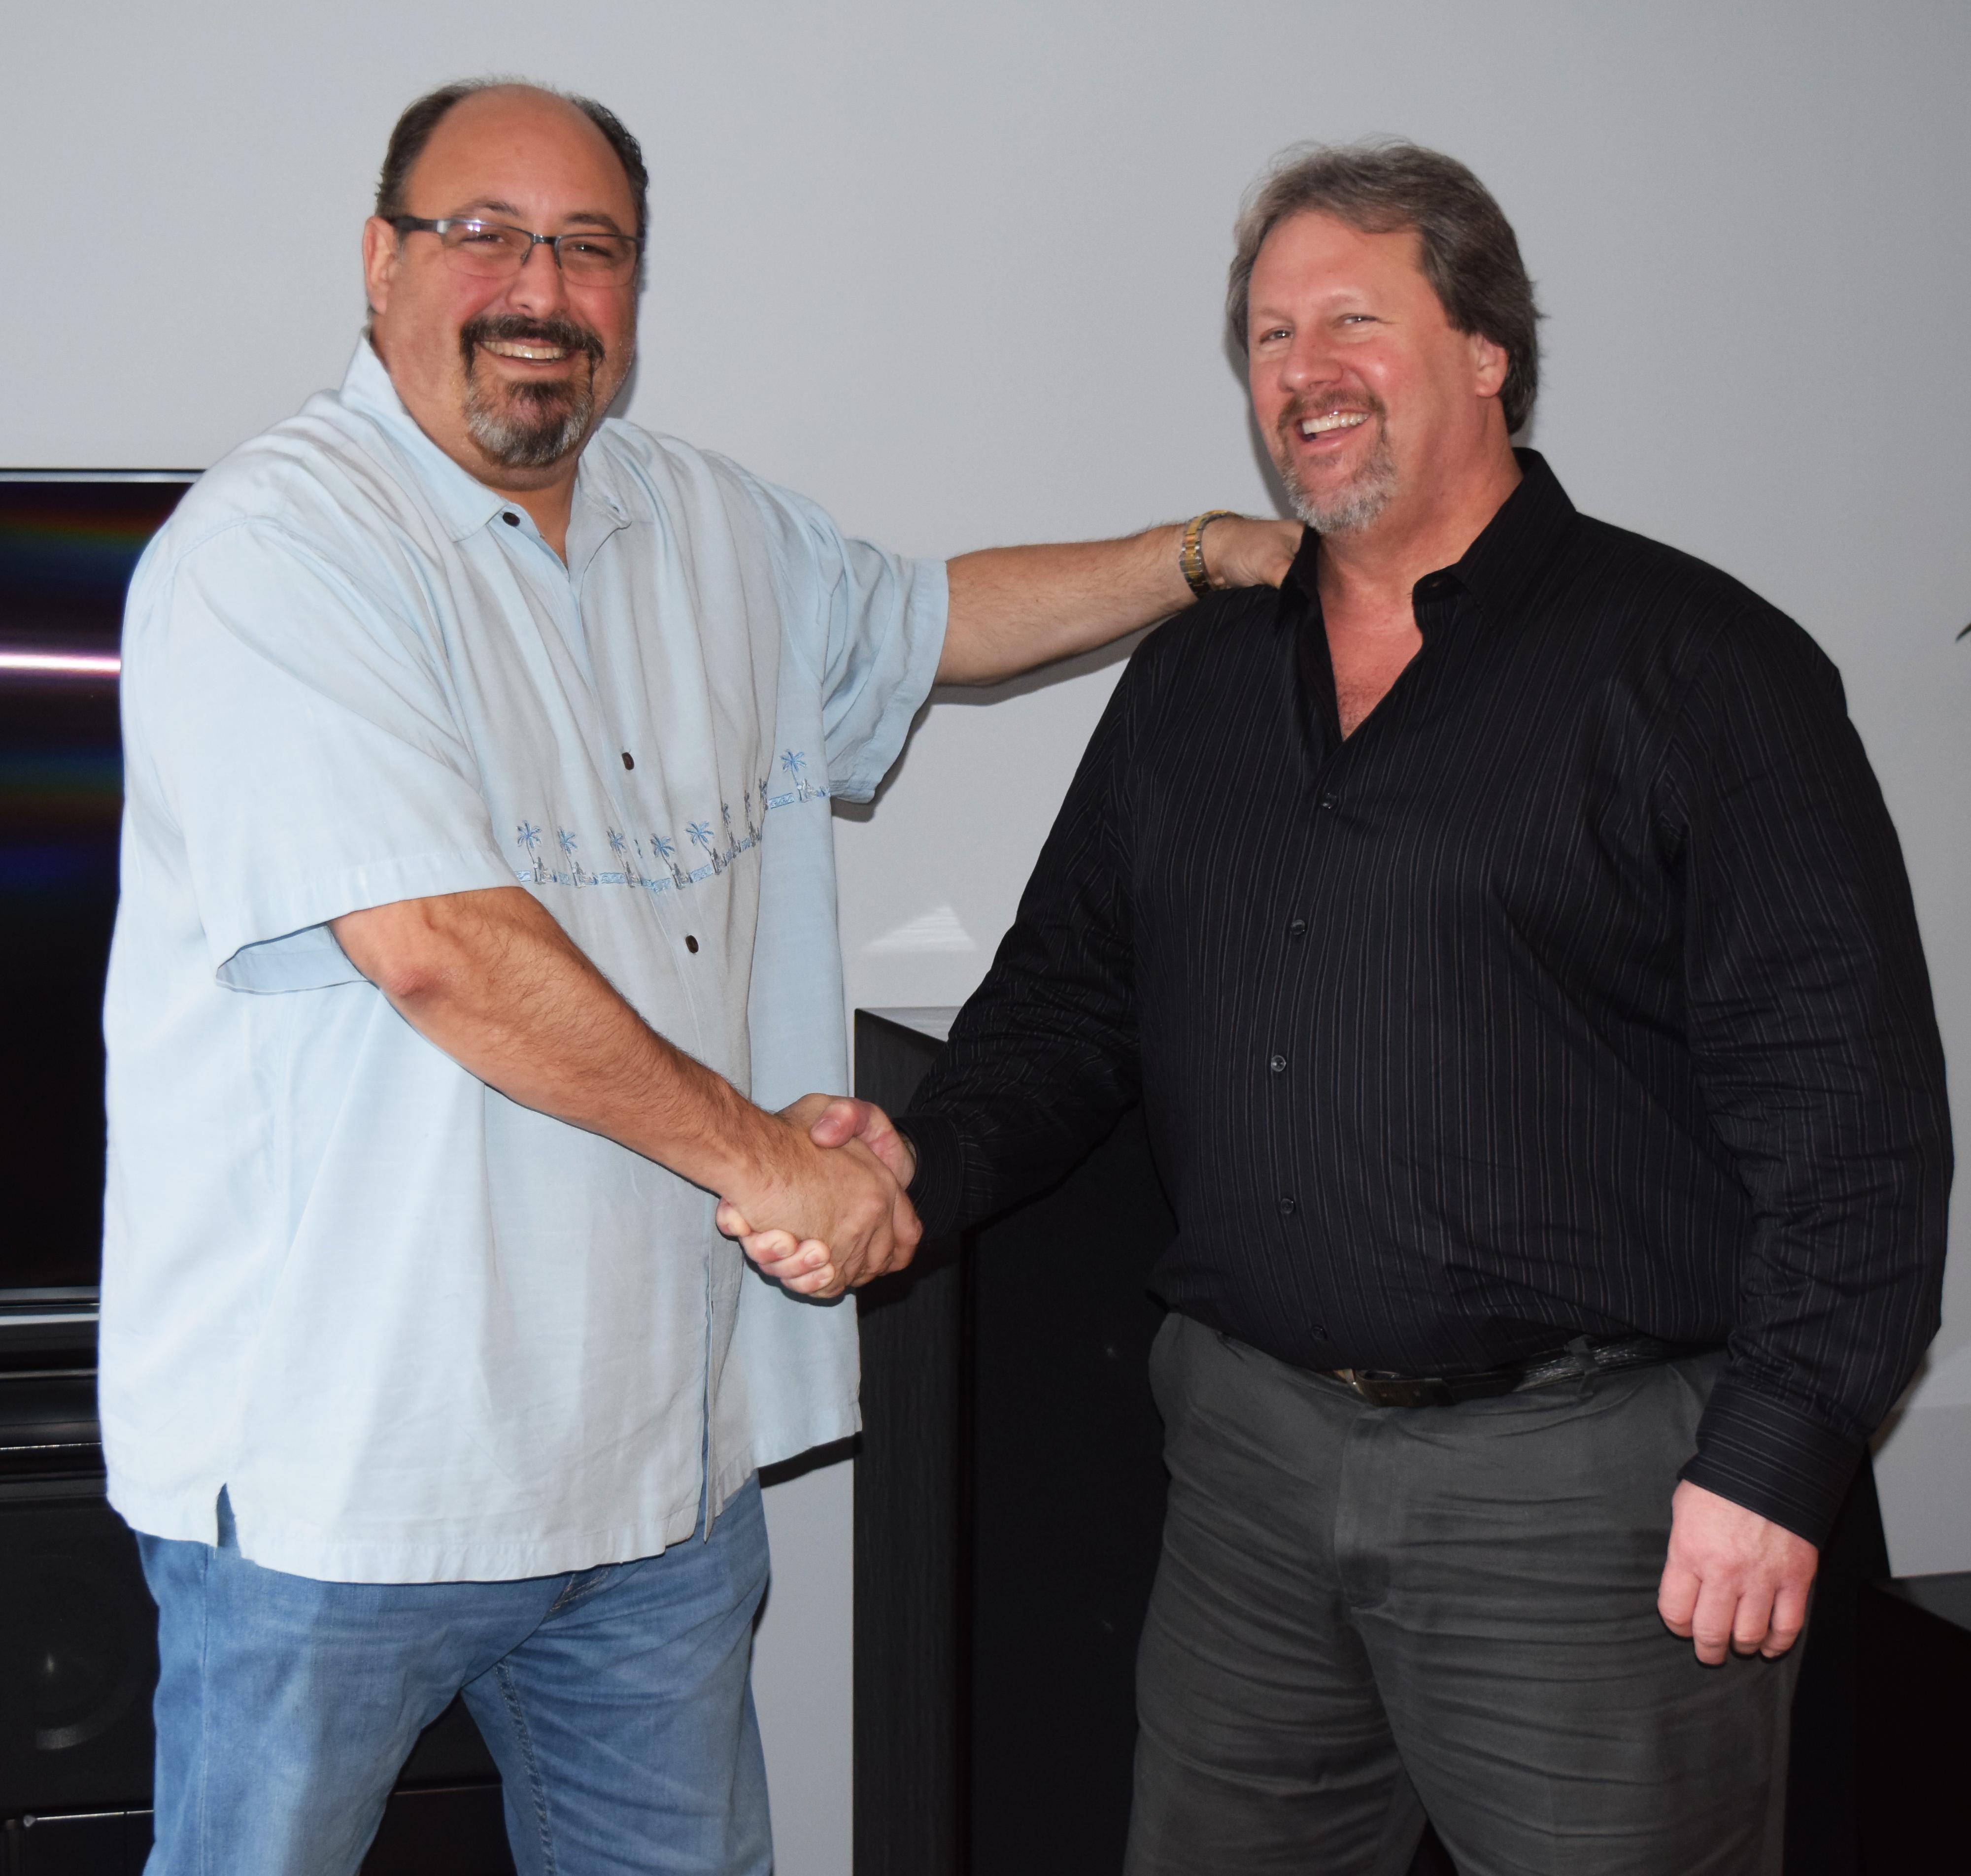 Bill Nicholson of Paradigm with Audiolab President David Levitan